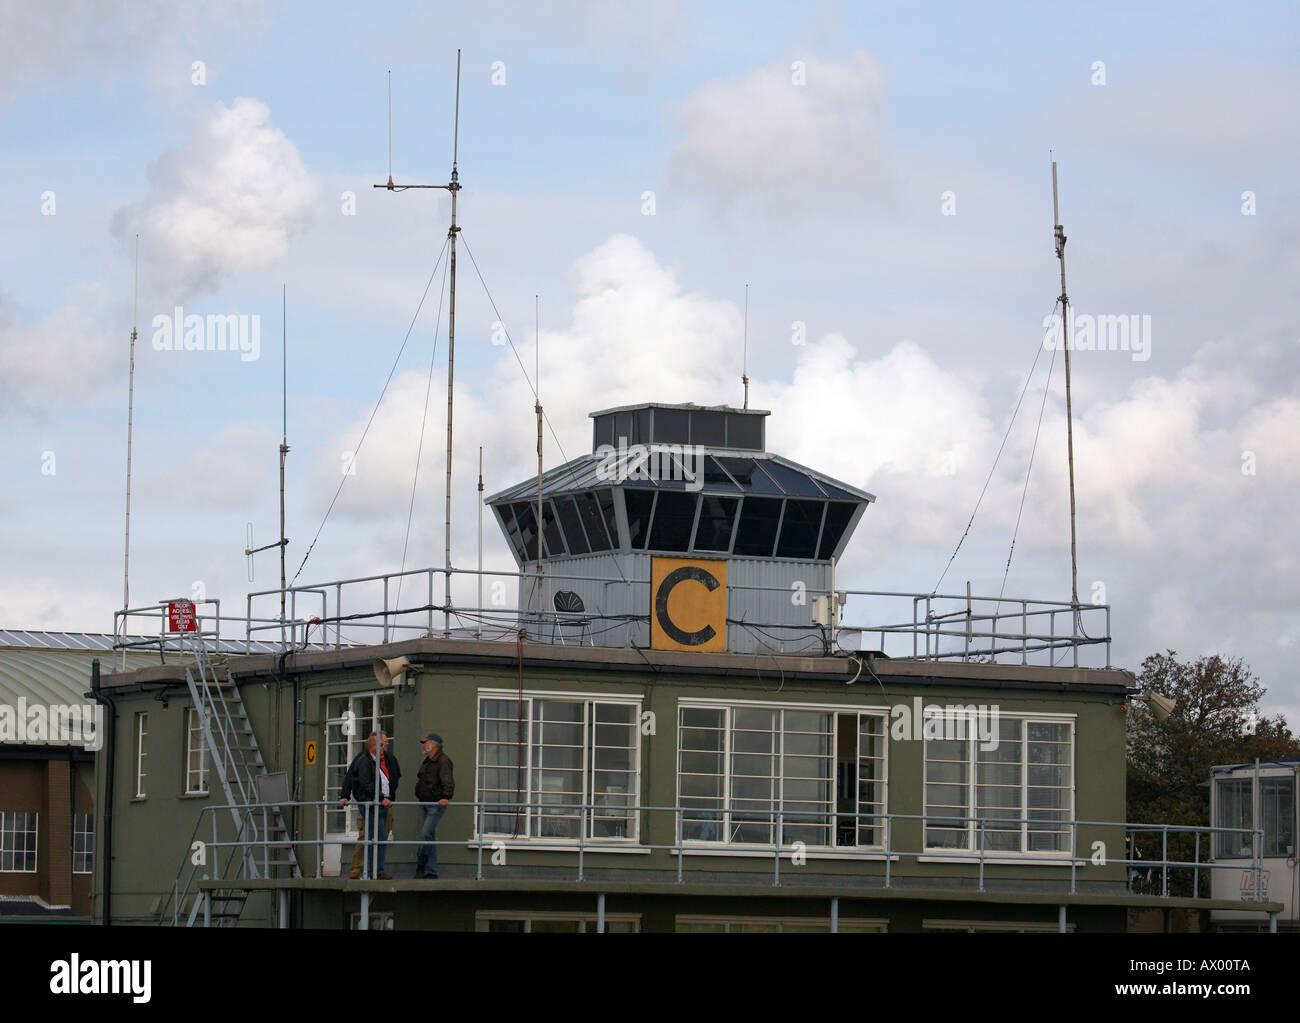 Control tower at Duxford aerodrome UK - Stock Image